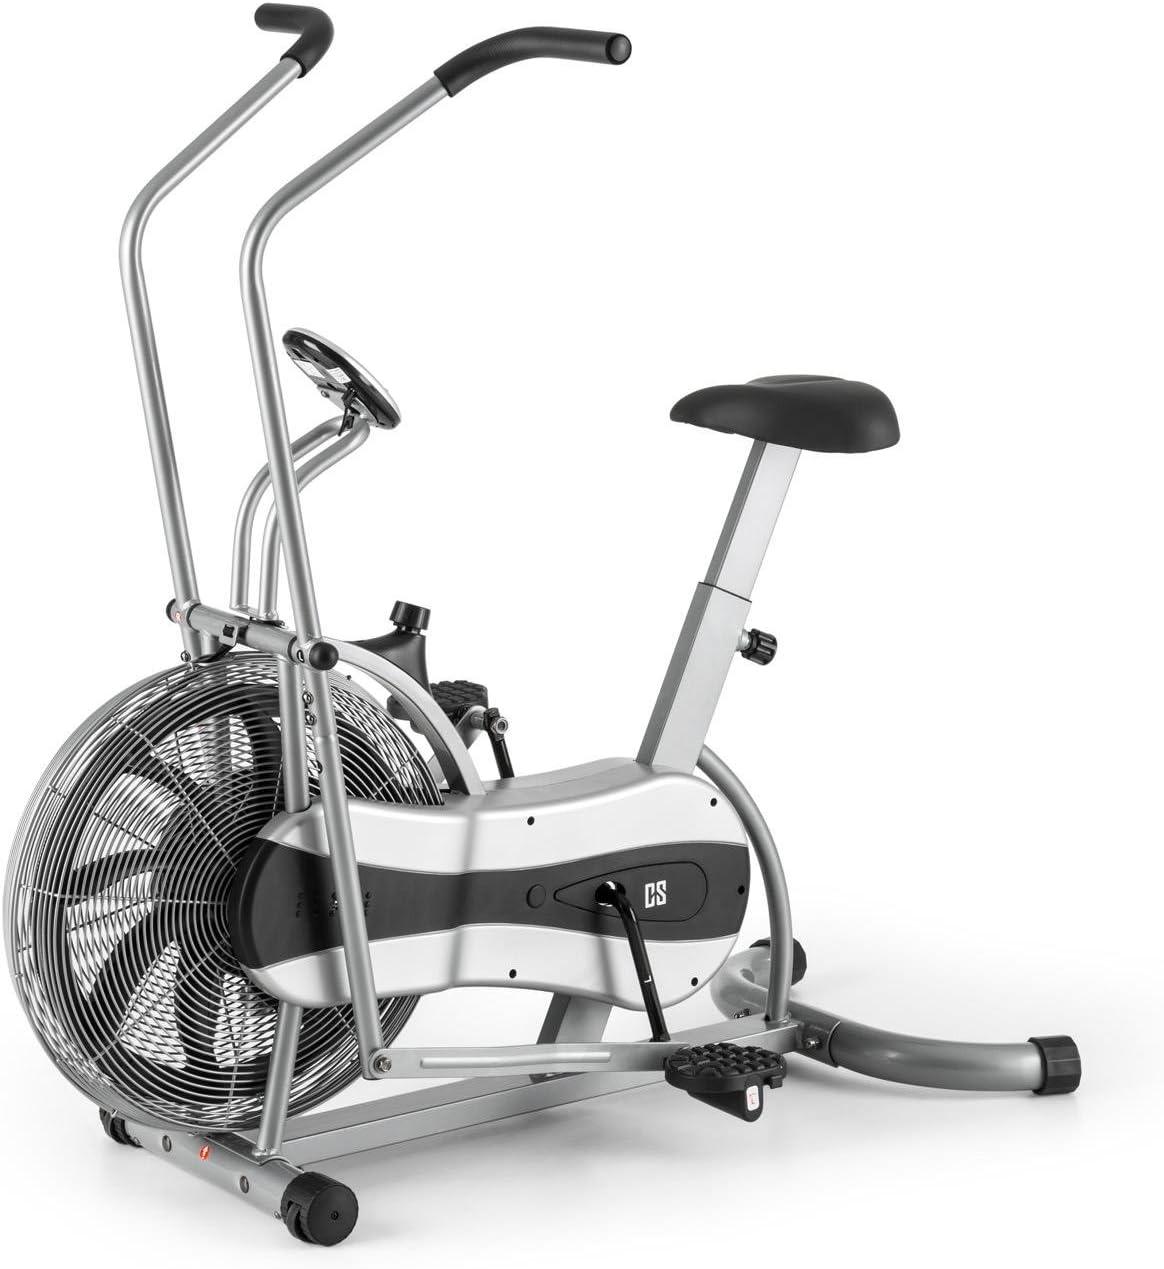 CAPITAL SPORTS Stormstrike 2k Máquina Elíptica Bicicleta Ergómetro ...